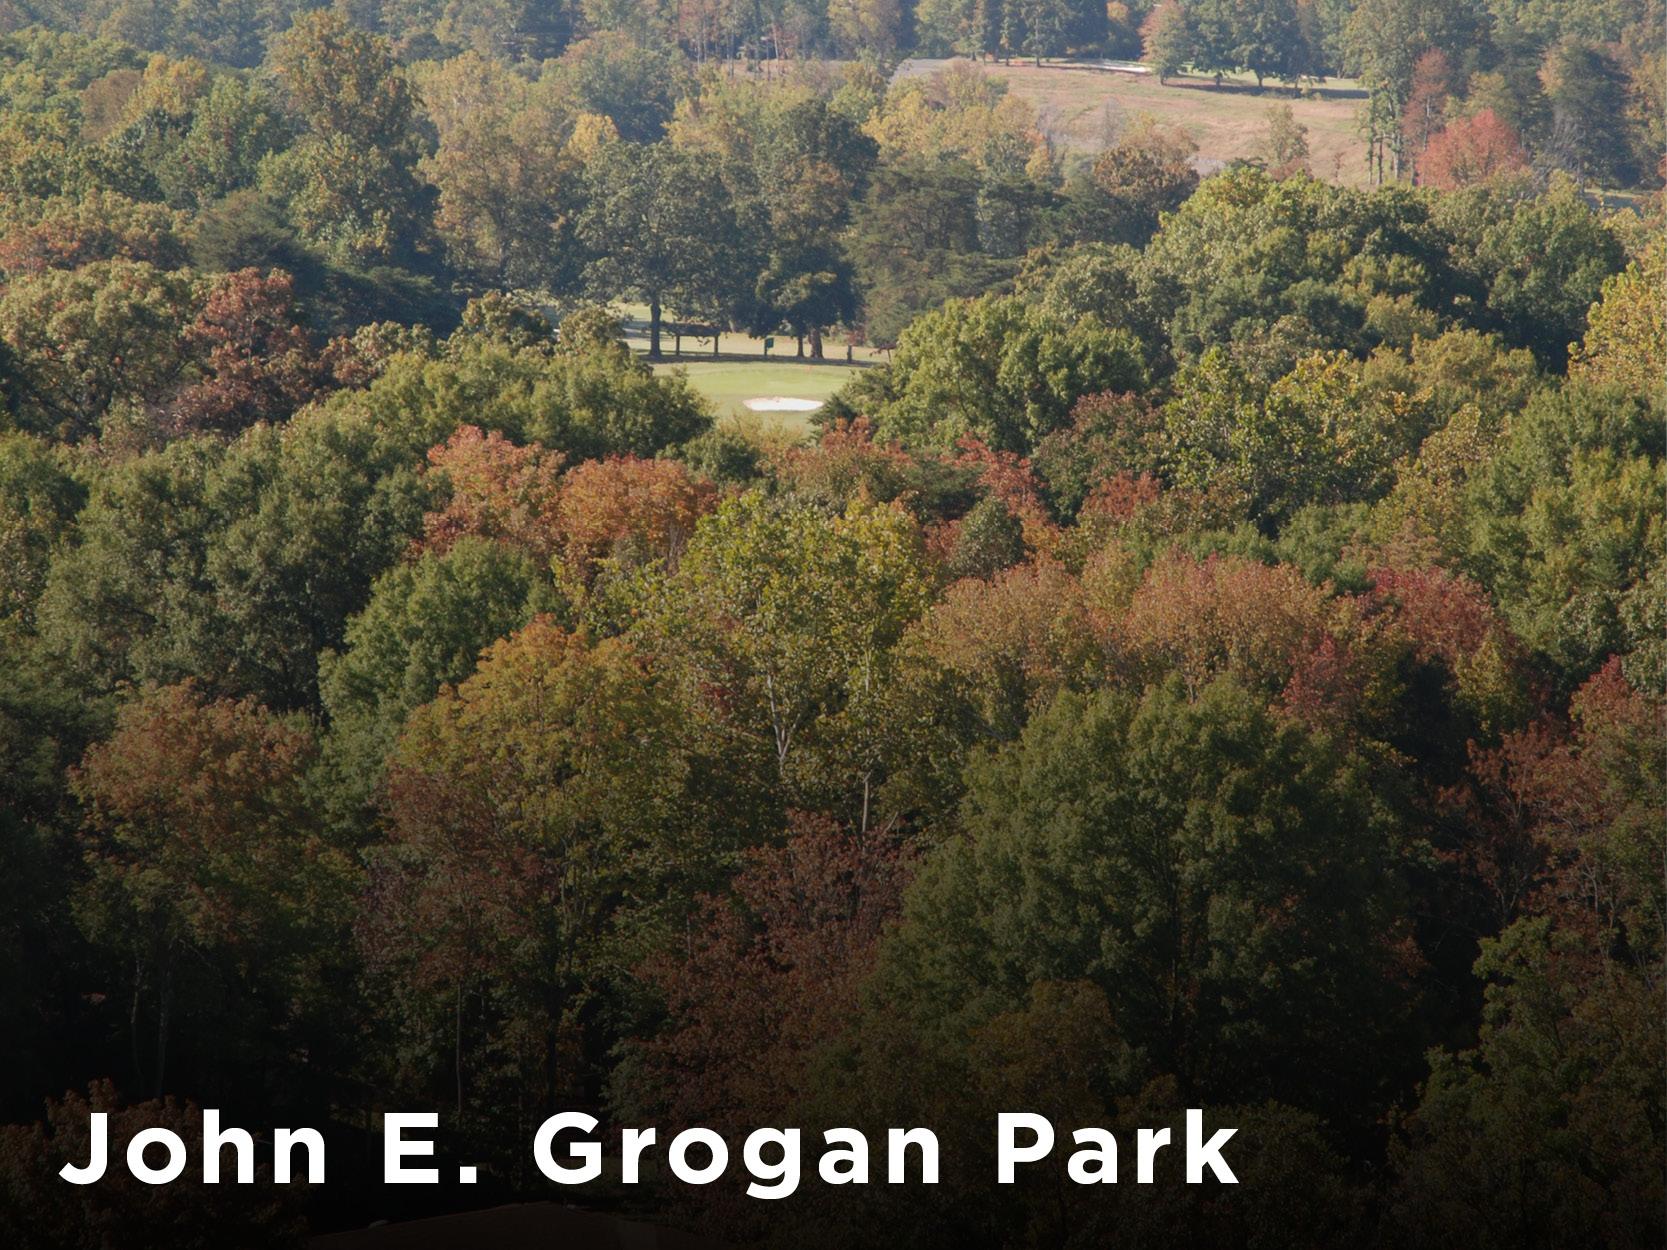 John E. Grogan Park